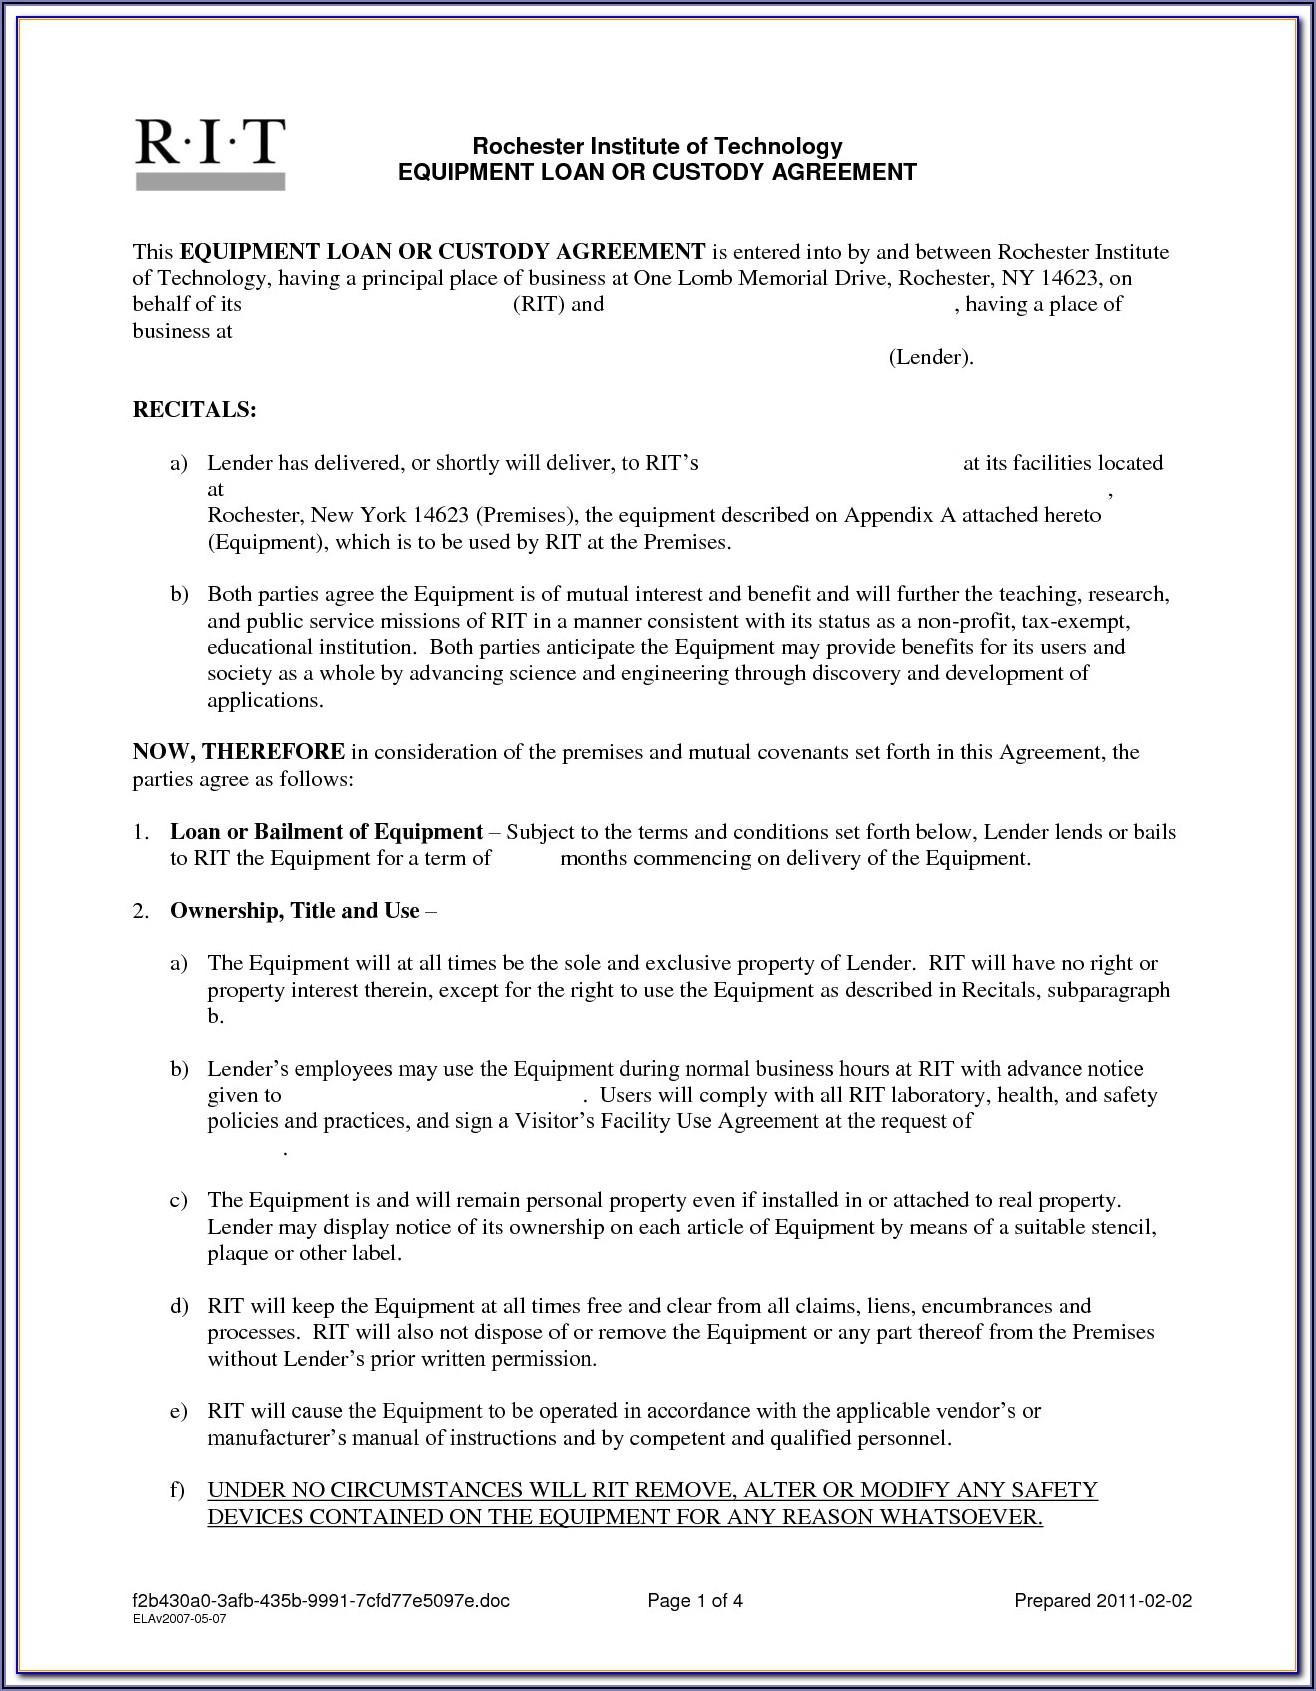 Sample Equipment Loan Agreement Form